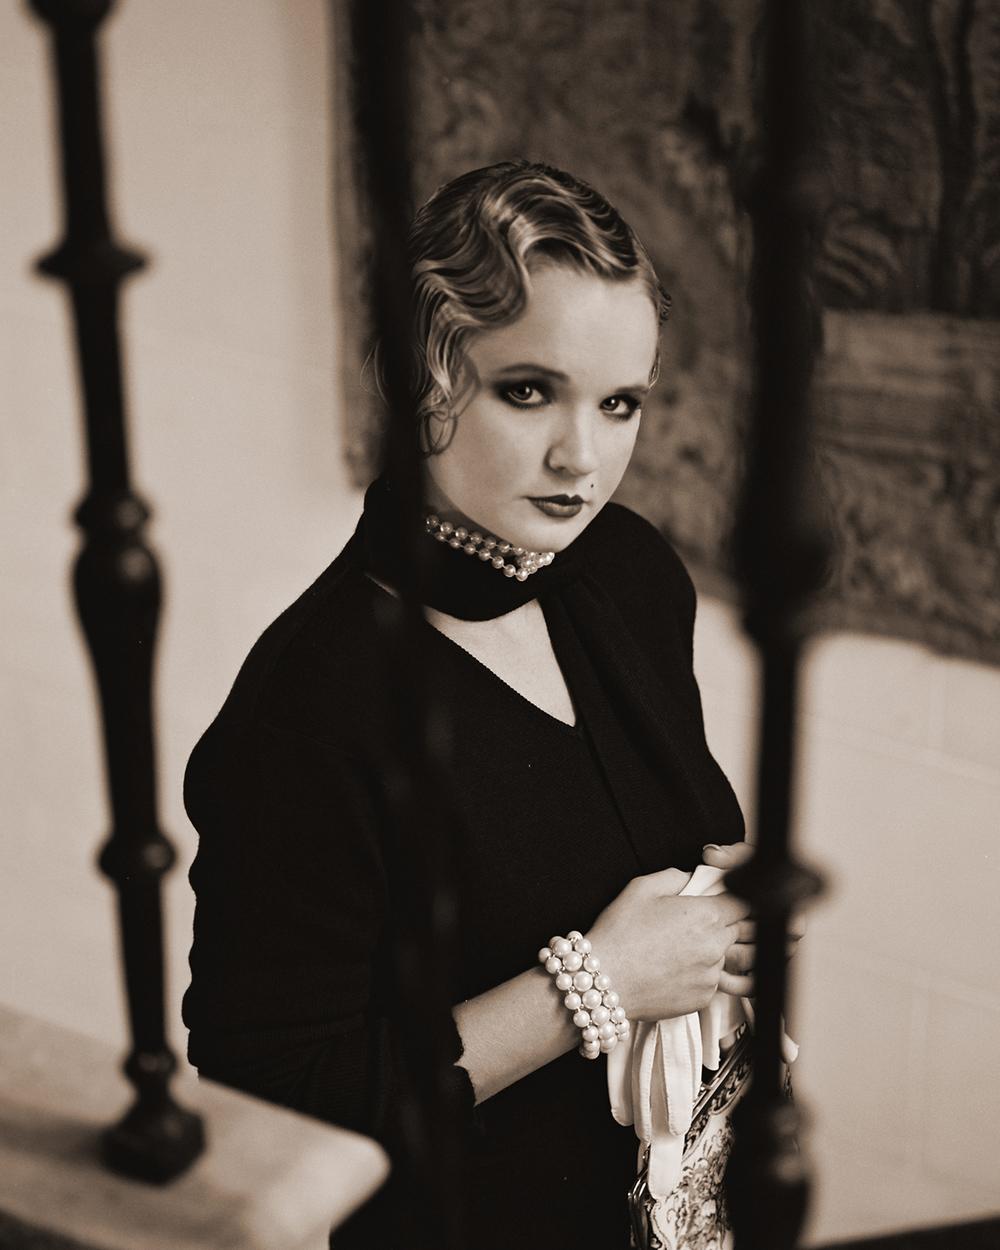 Rick-Ferro-Holloywood-Glamour-Portrait.jpg